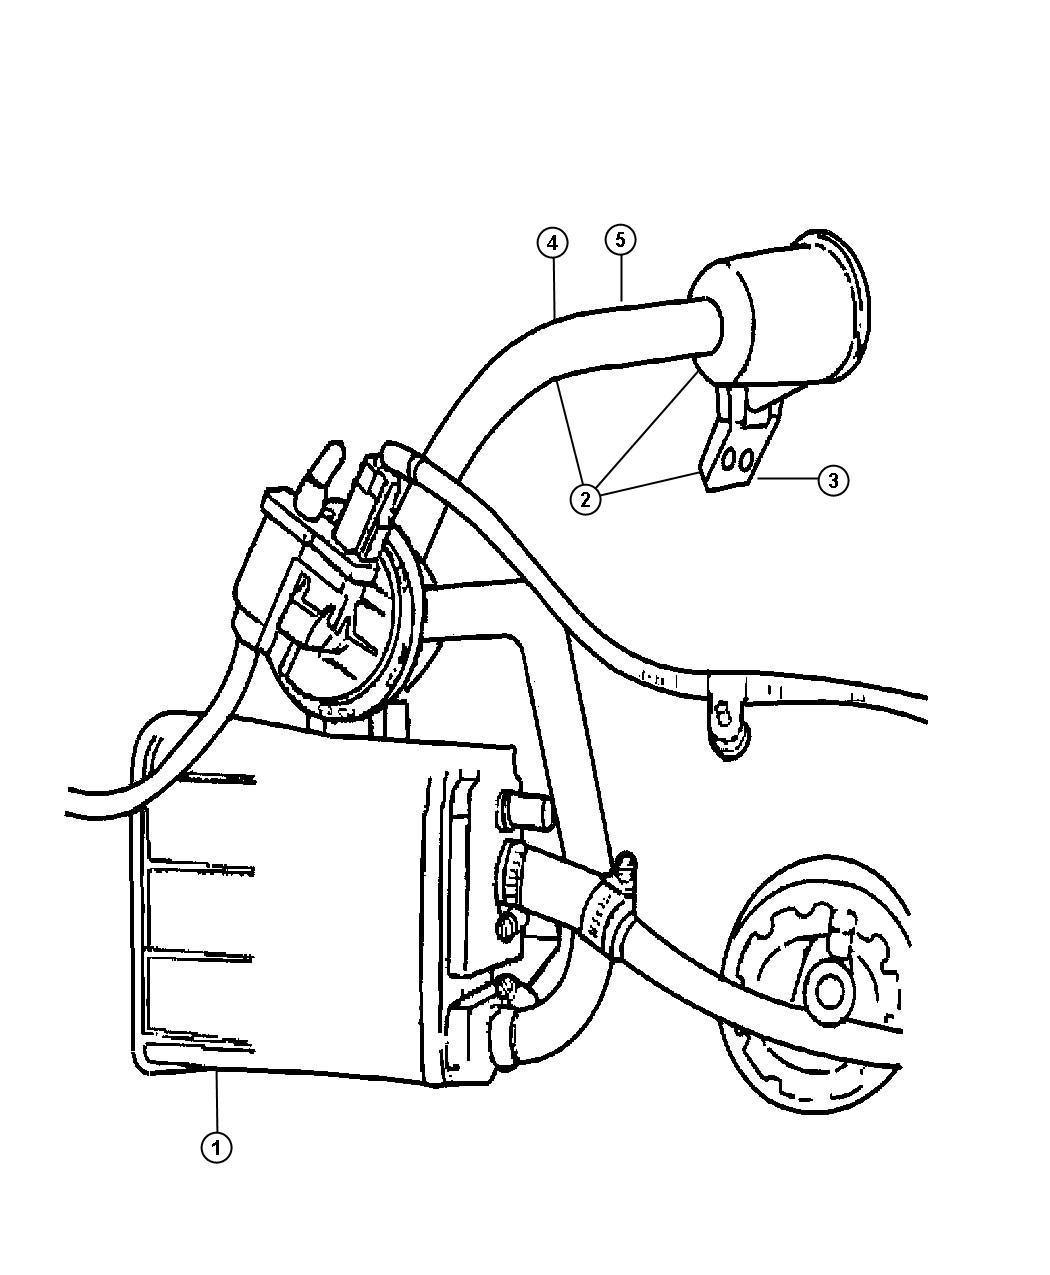 04 dodge ram 1500 fuel filter location